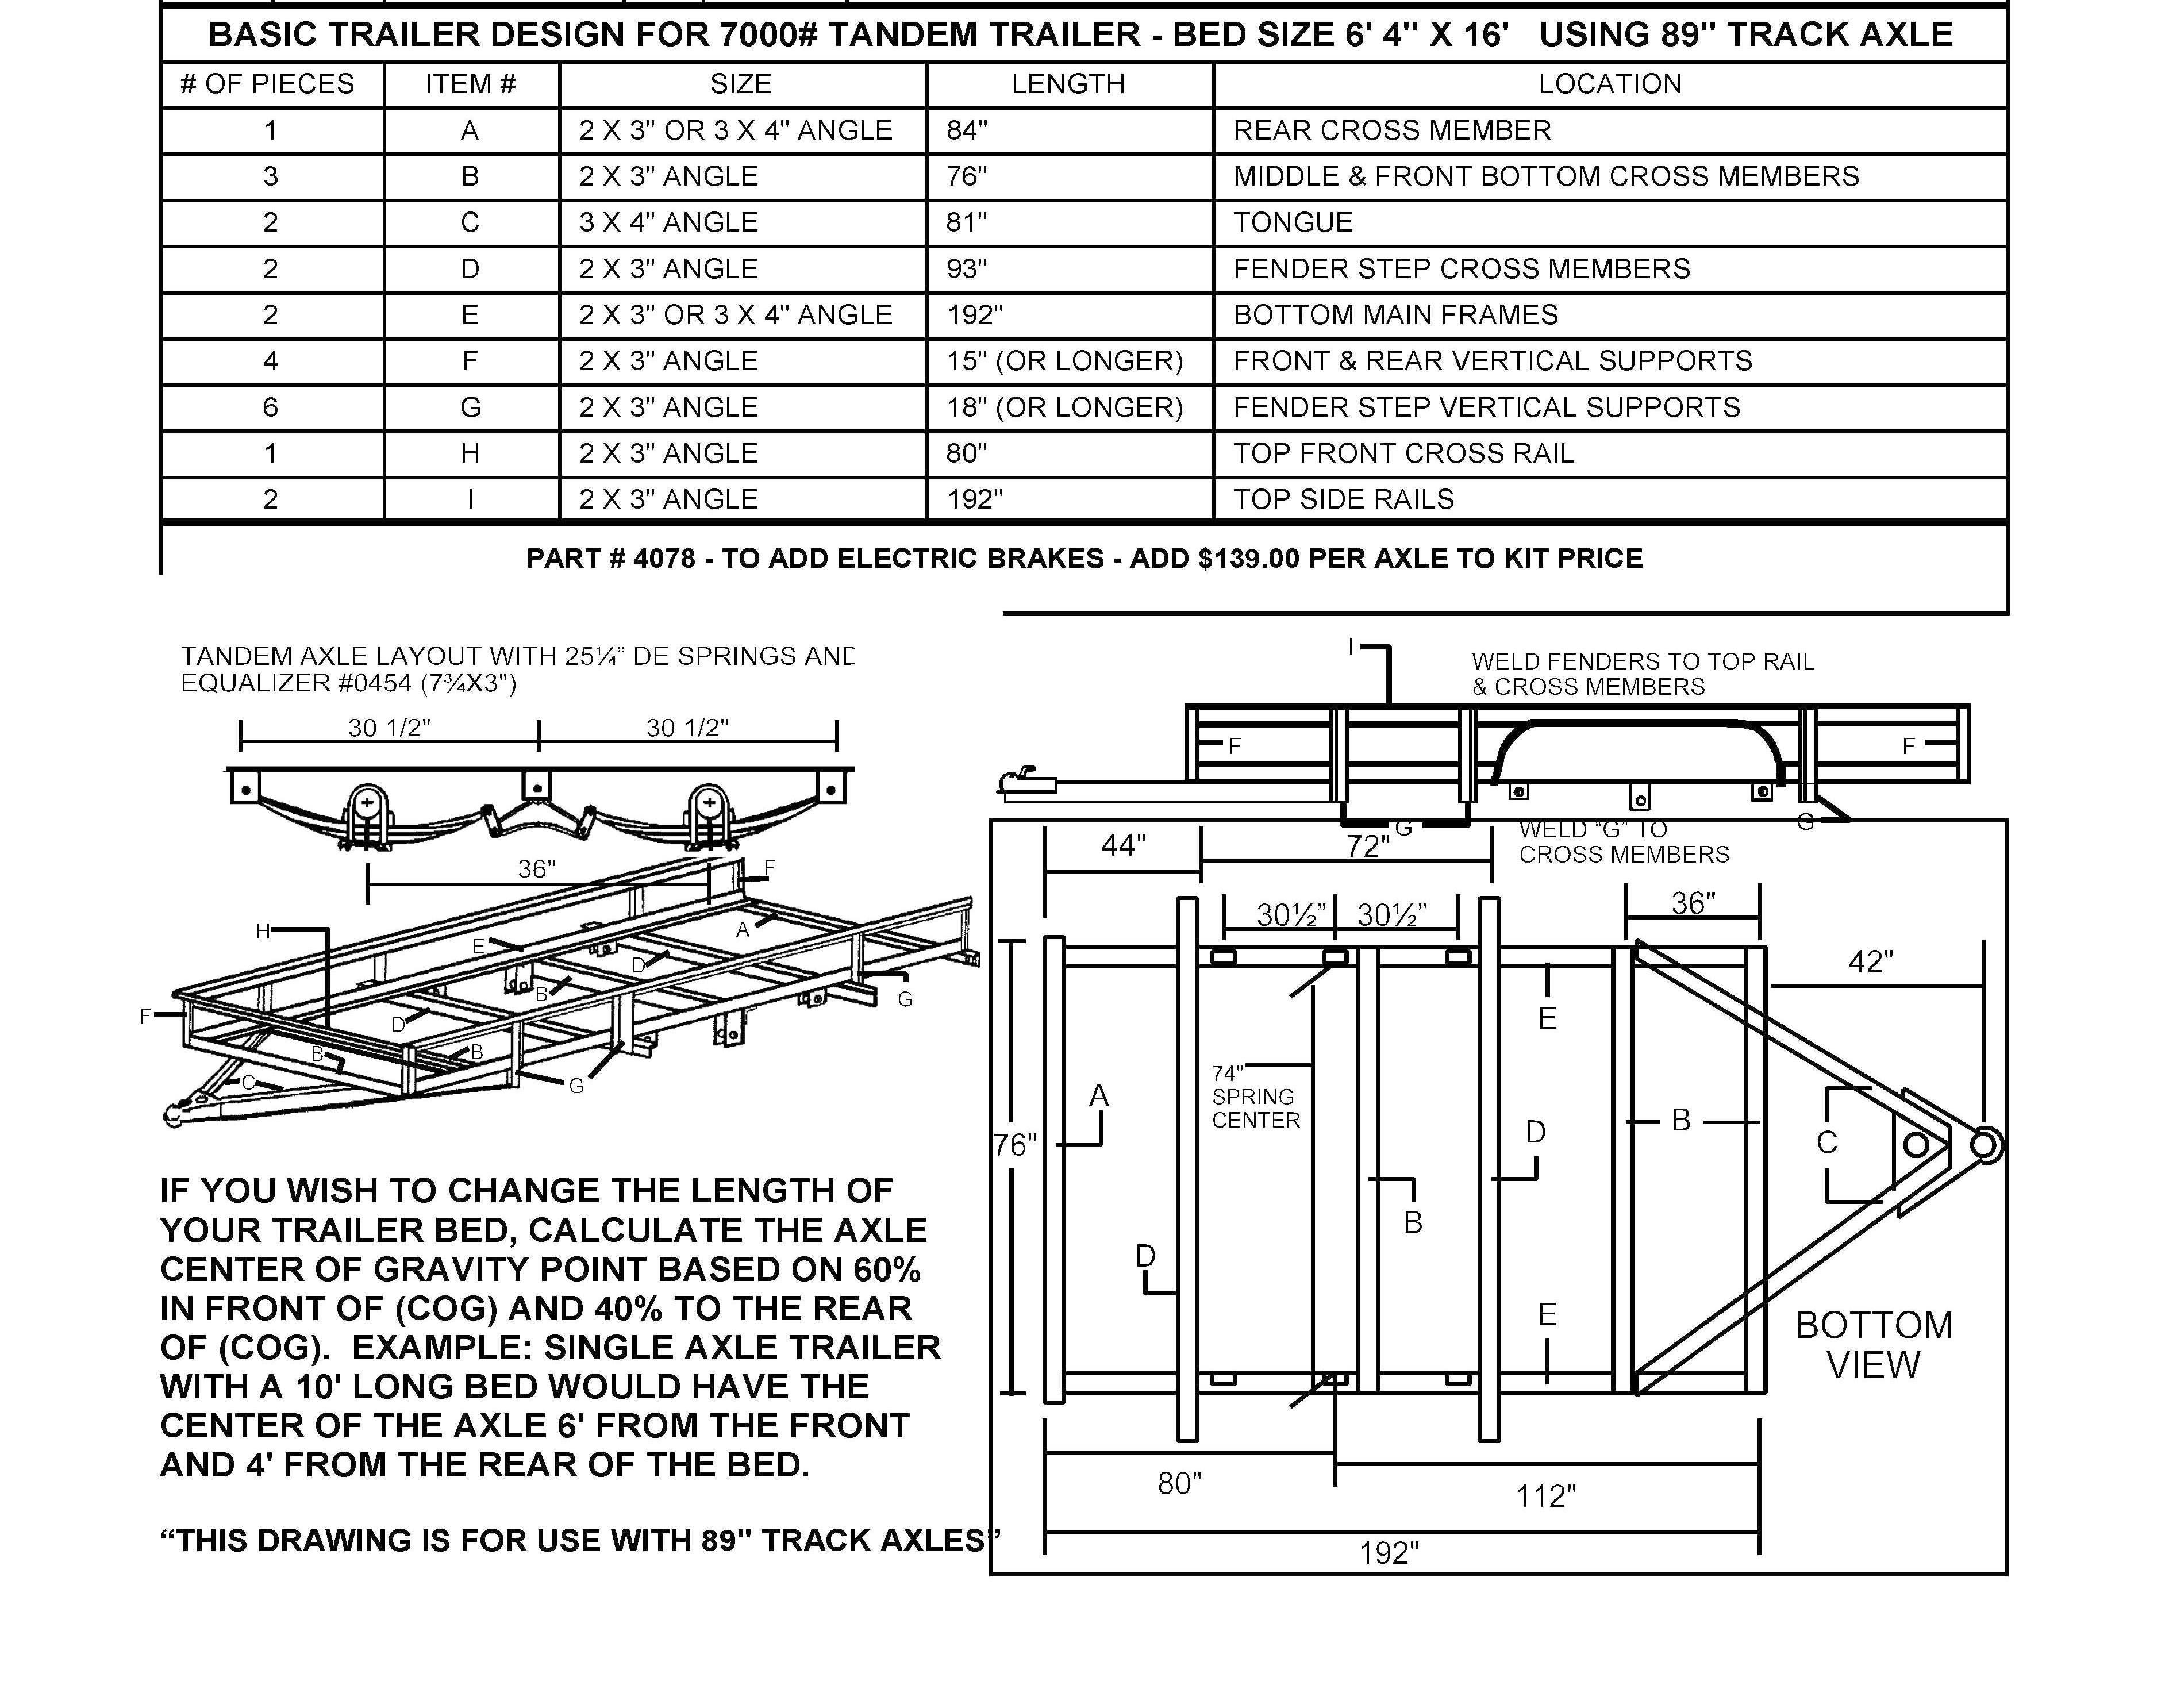 95 Tandem Trailer Parts Kit 7 000lbs Gvwr Utility Trailer Trailer Plans Trailer Kits